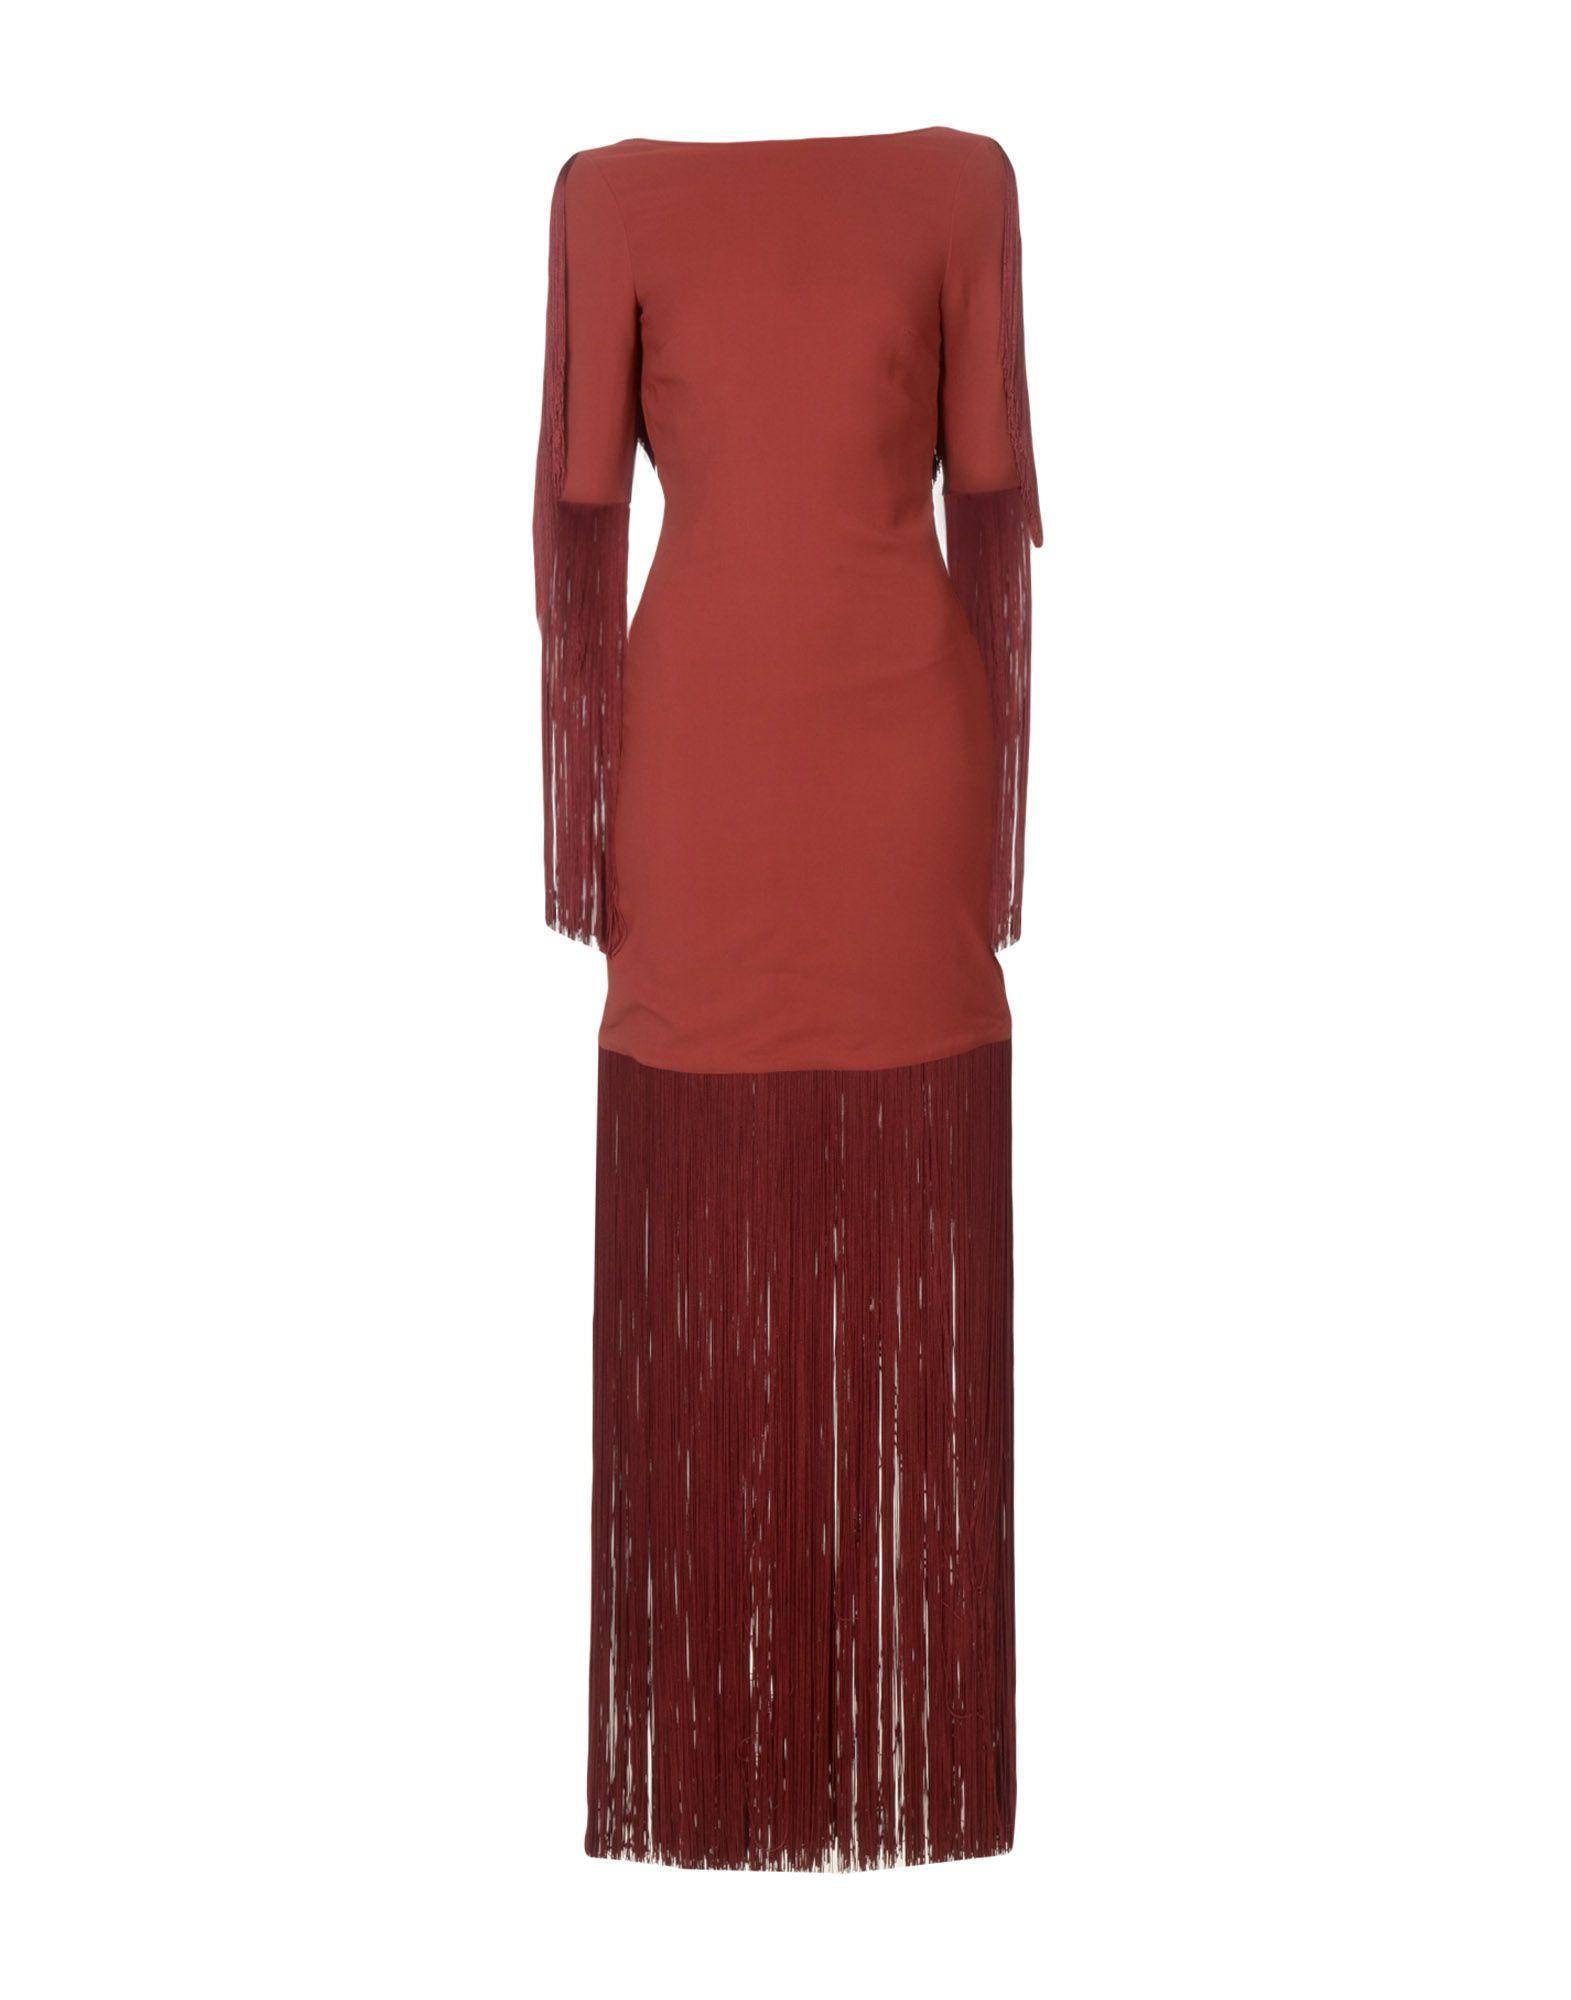 Michael Kors Long Dress In Maroon